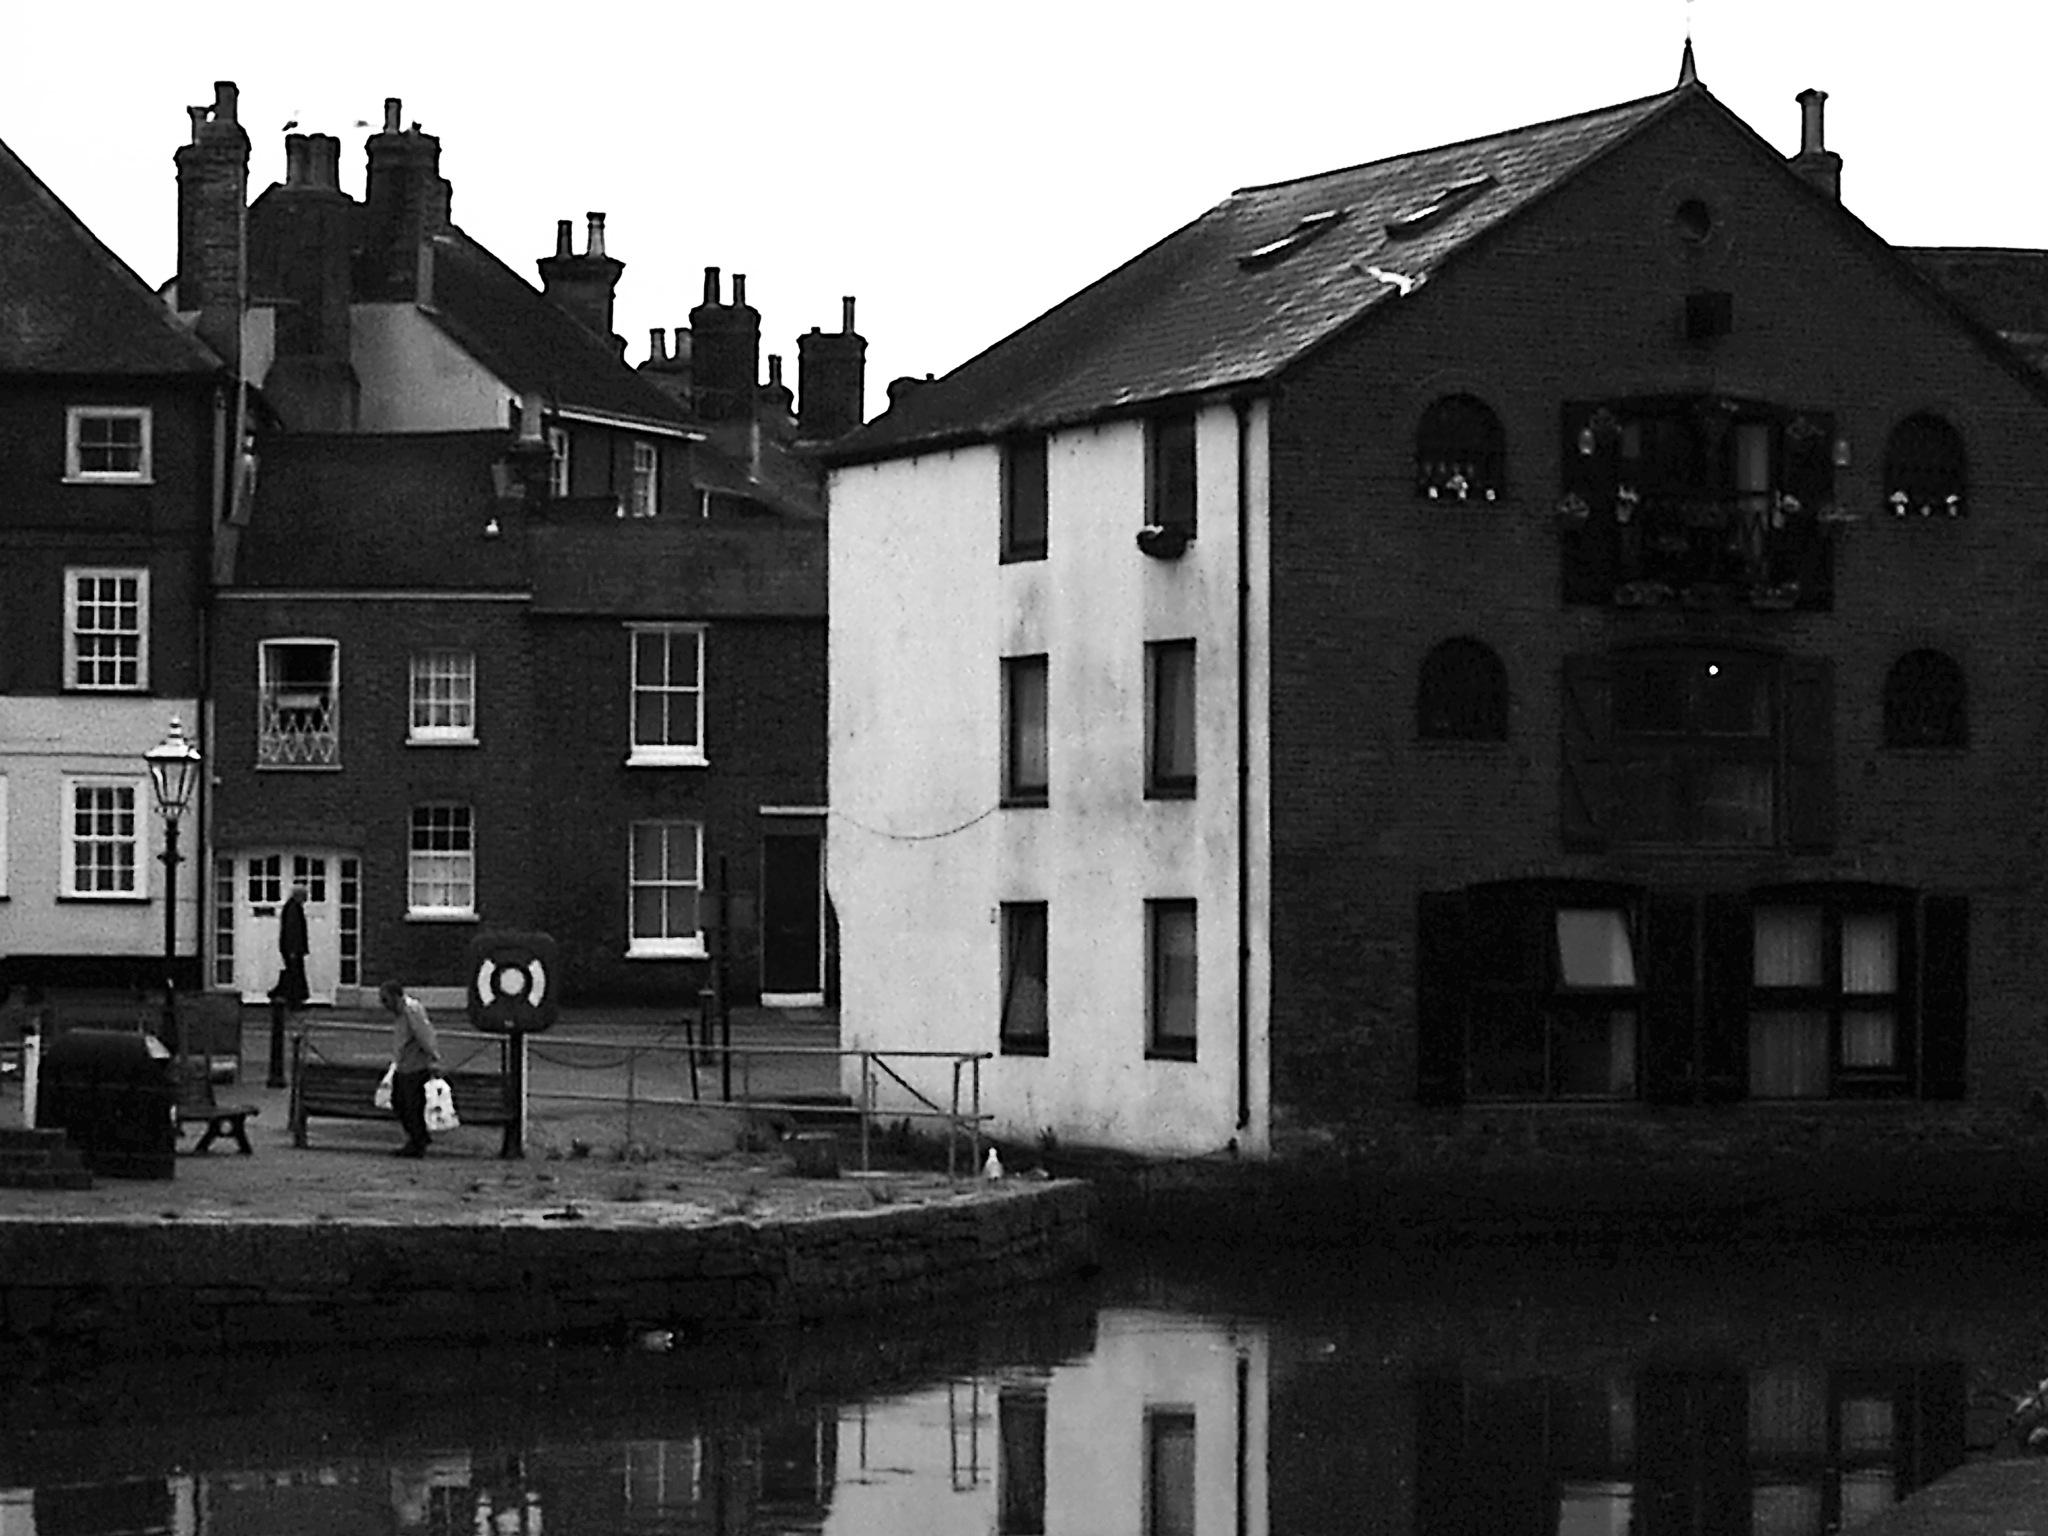 docks by james arthur